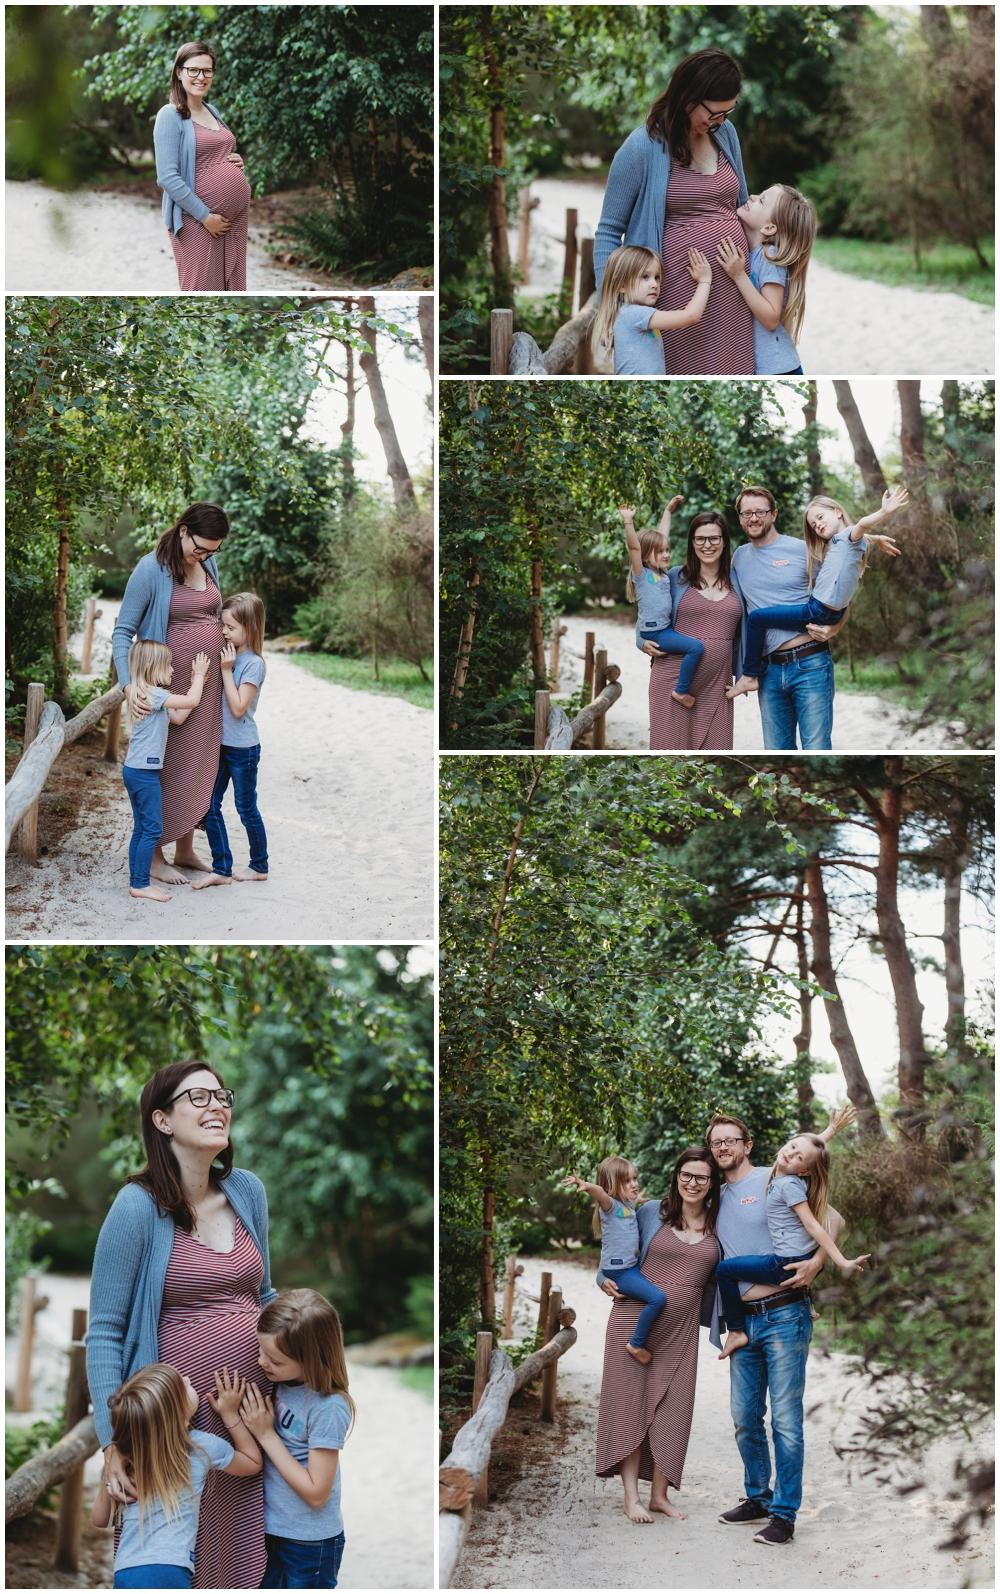 Britta-Passmann-Fotogarfie_Familienfotos_Kinderfotos_Babybauchfotos_Dortmund_Fotoshooting-Dünen_Schwangerschaftsfotos